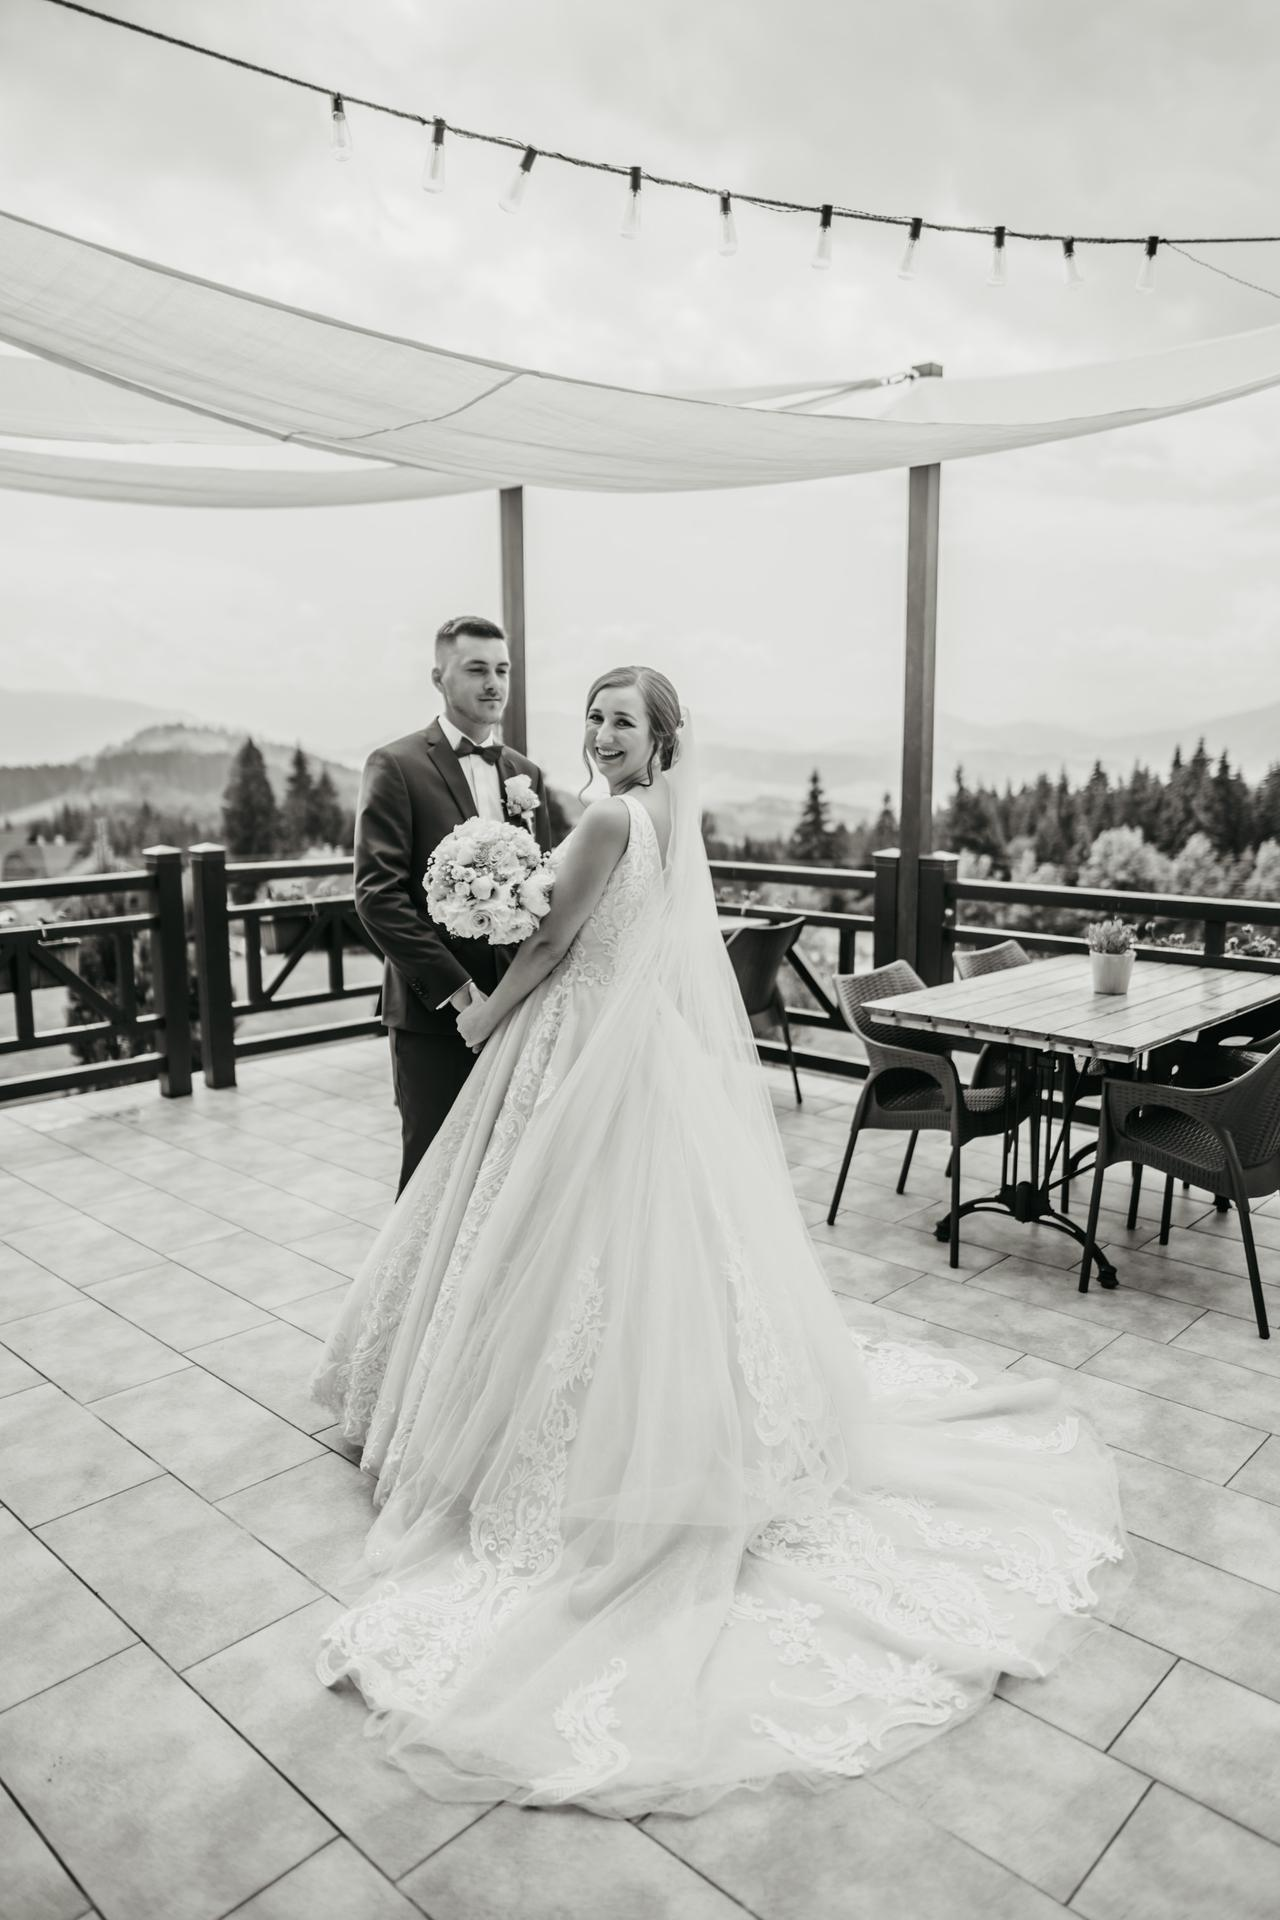 Our wedding ❤️ - Obrázok č. 9